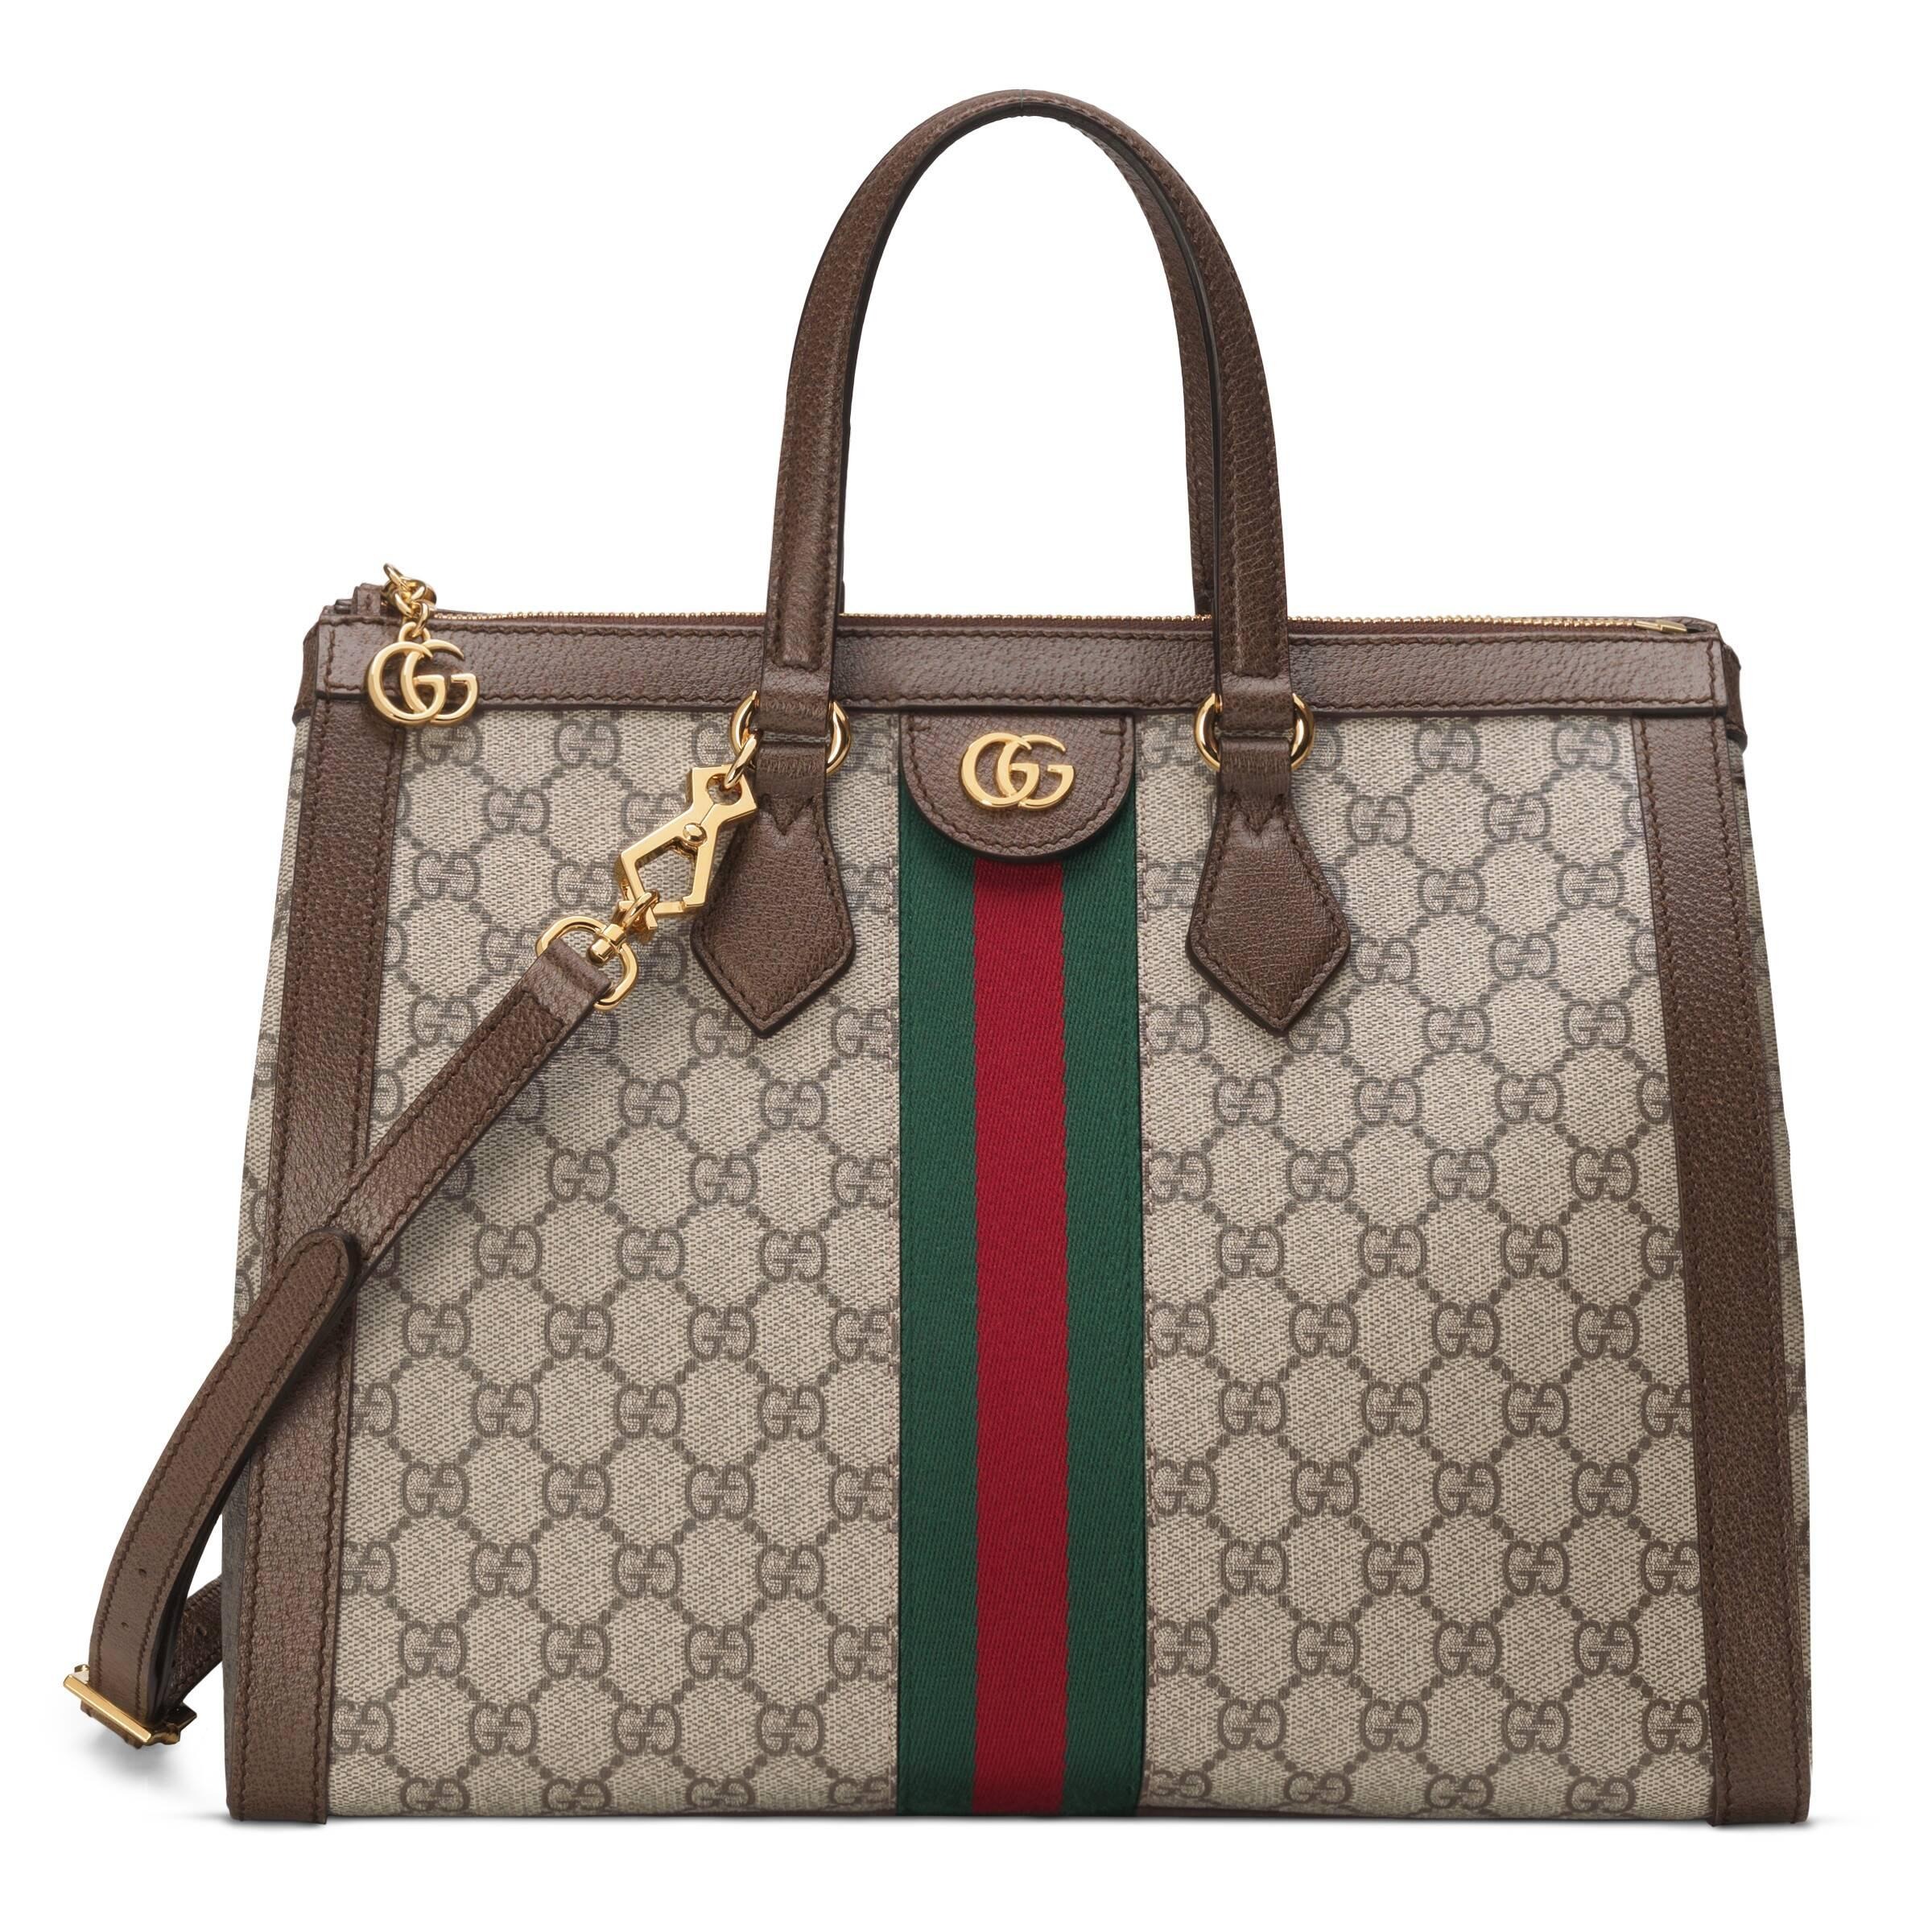 a4e05f642a83 Gucci Ophidia GG Medium Tote Bag in Natural - Lyst